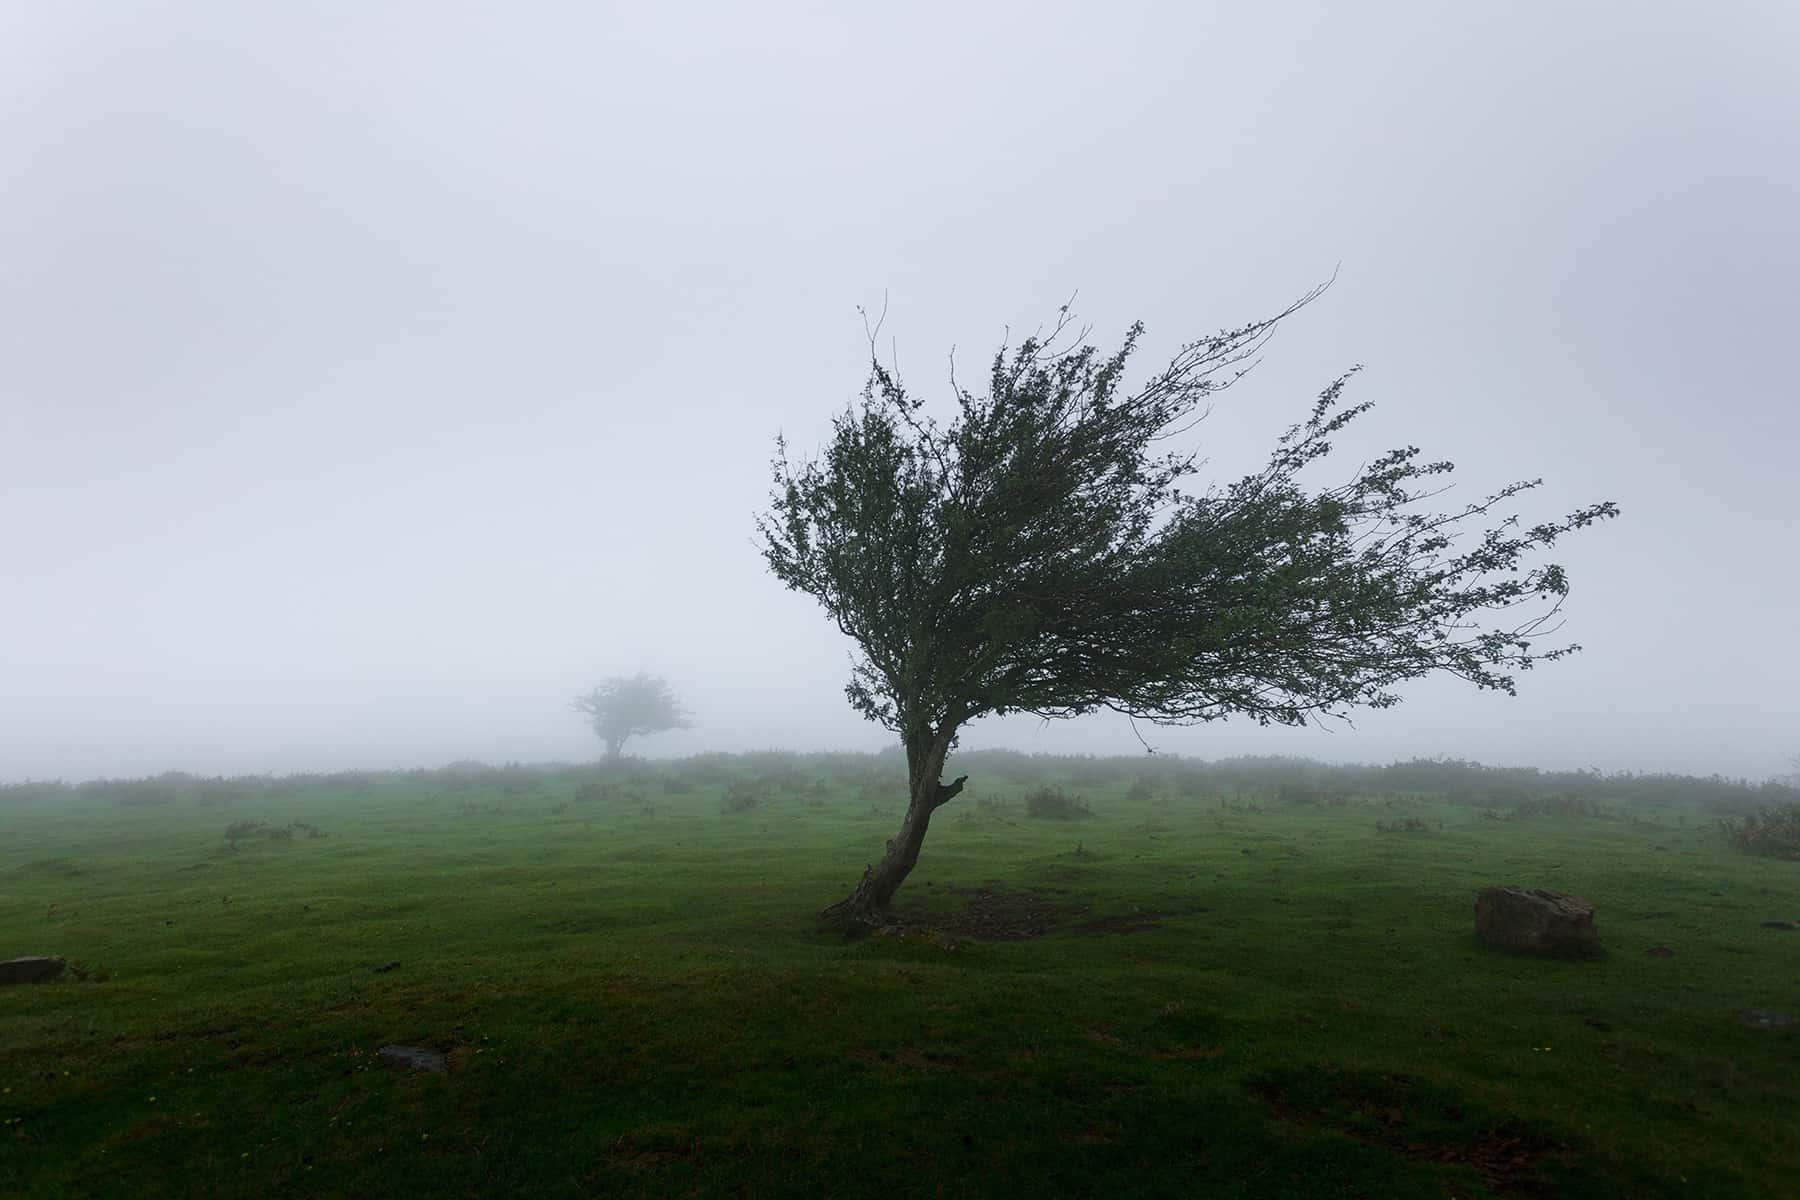 roof damage insurance claim wind